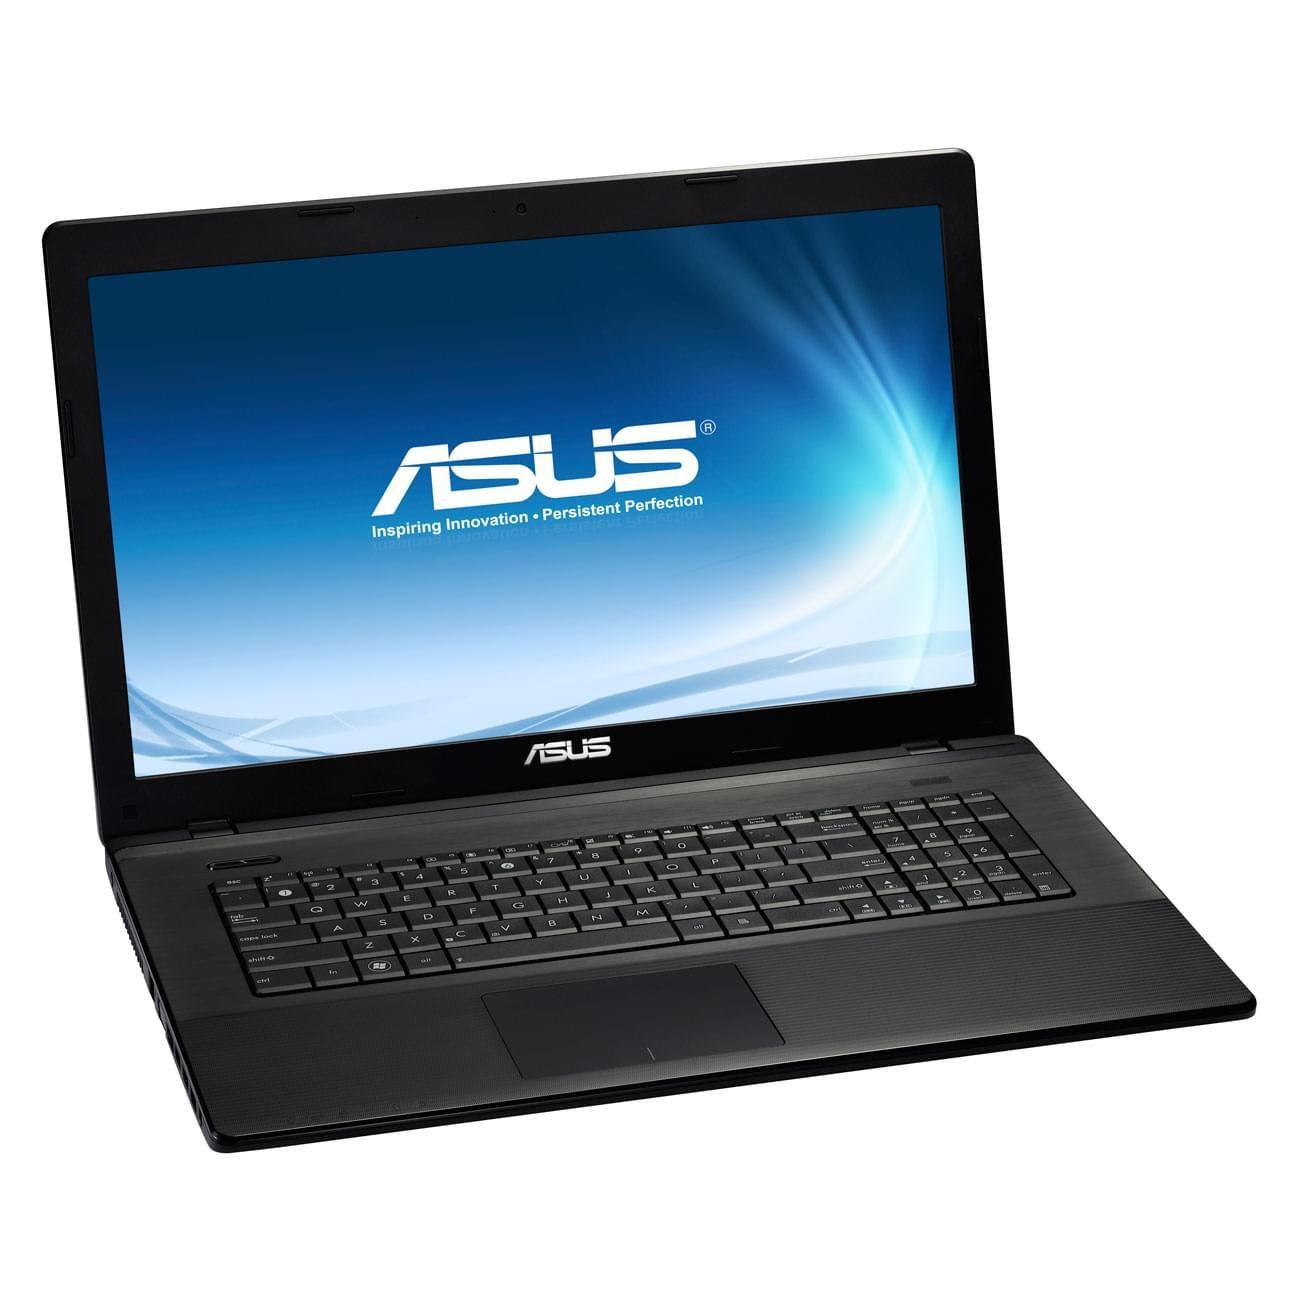 Asus X75VD-TY082V (X75VD-TY082V) - Achat / Vente PC portable sur Cybertek.fr - 0